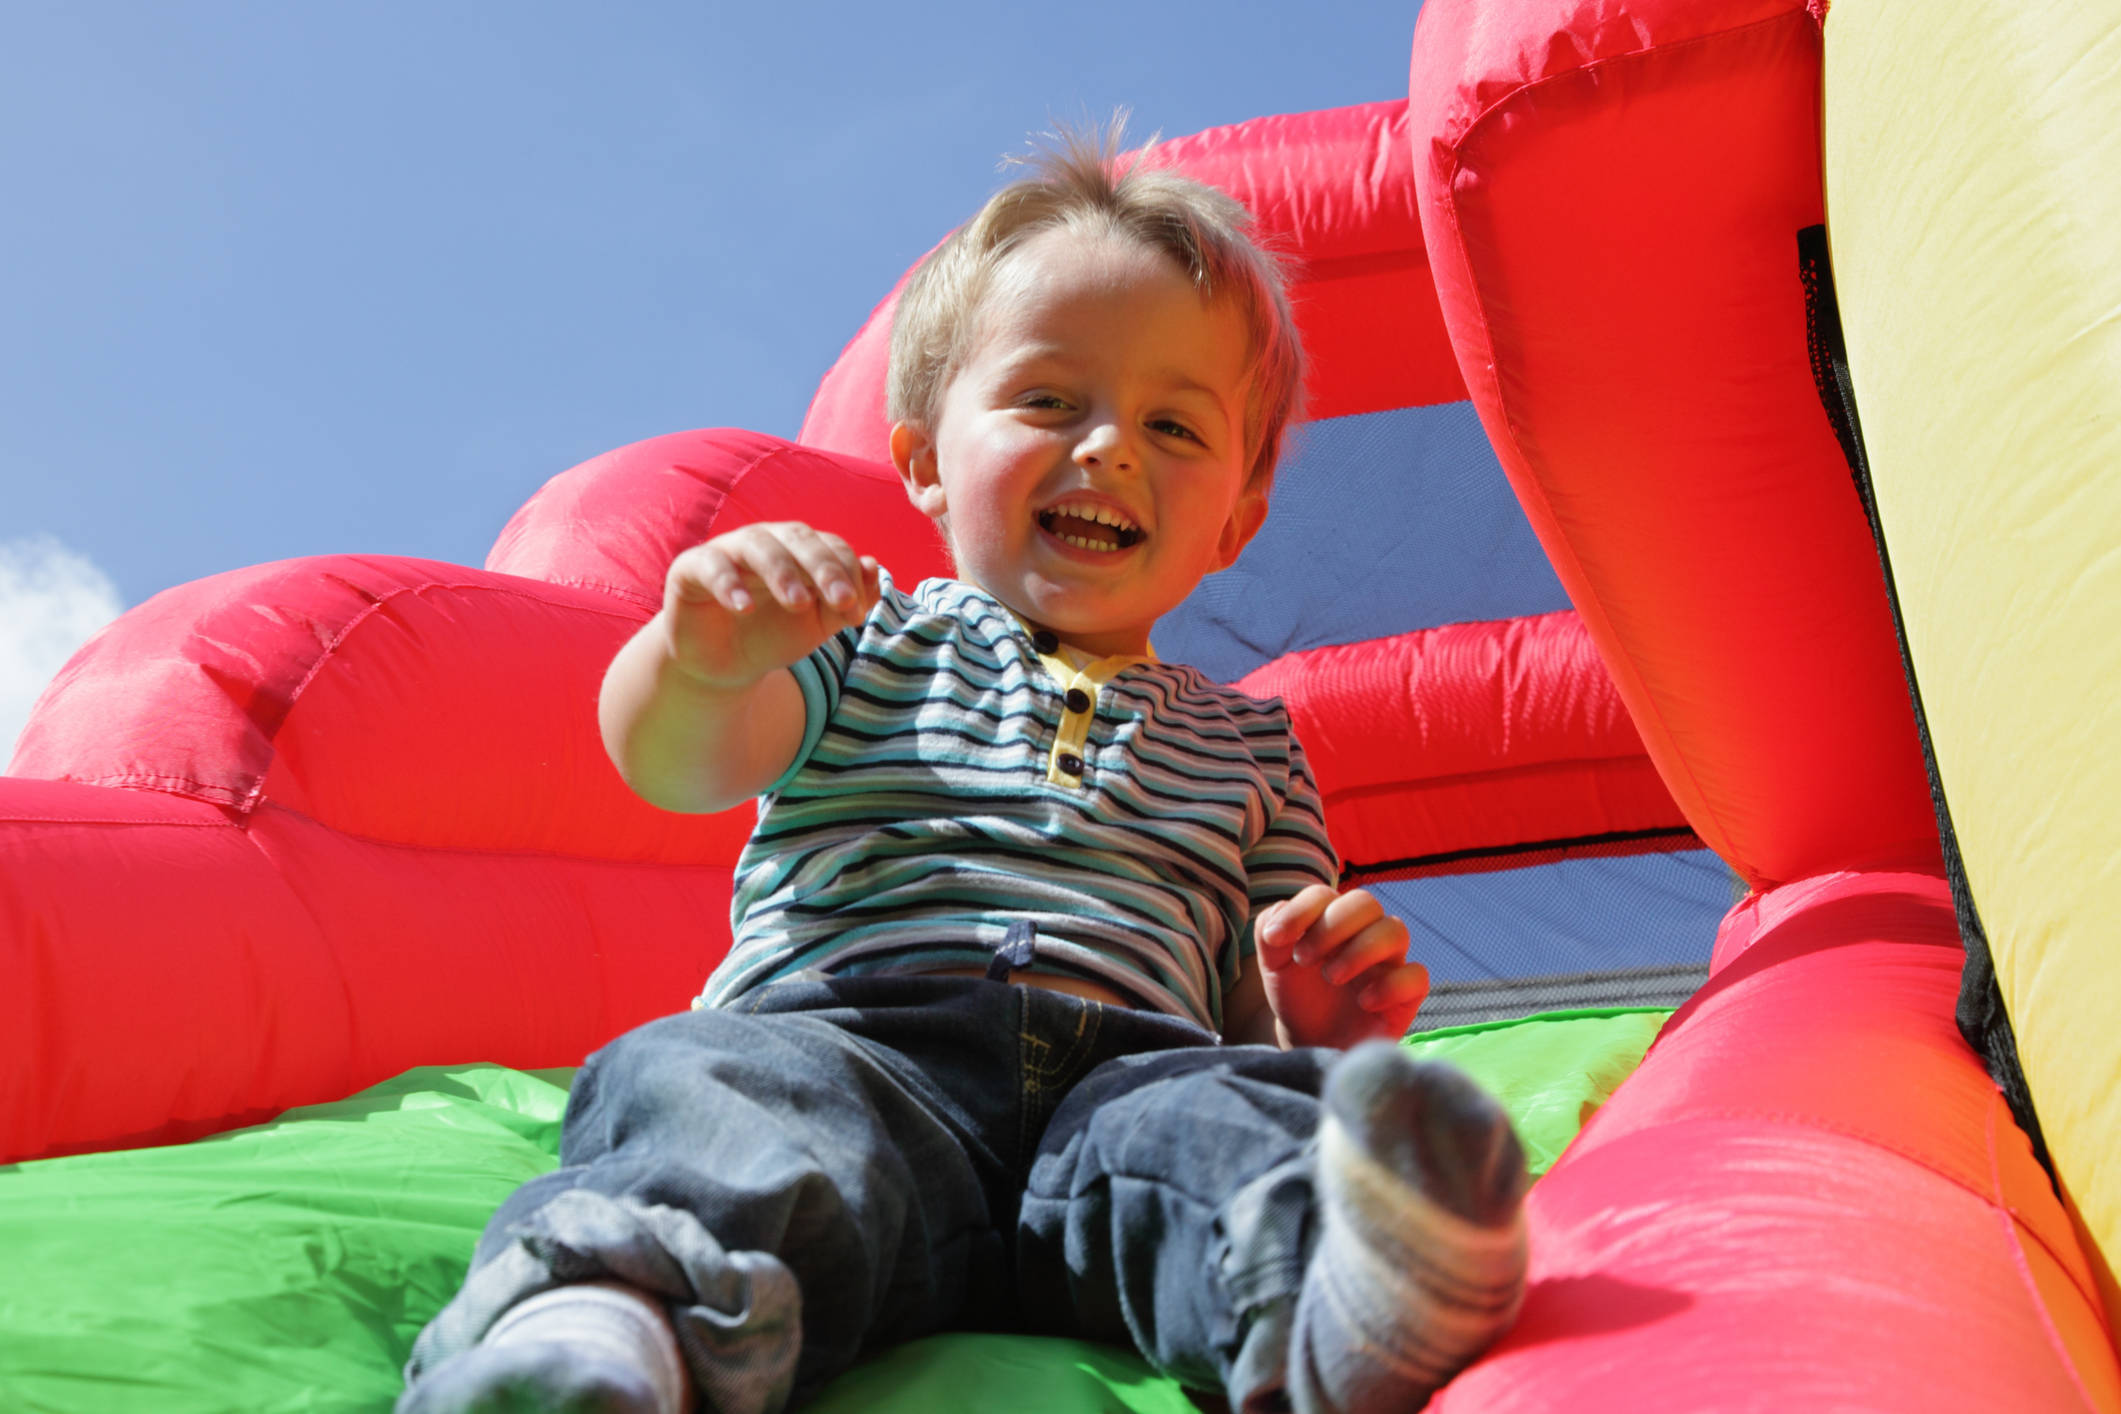 b10aeb0a968401fba542_boy_on_inflatable_slide.jpg